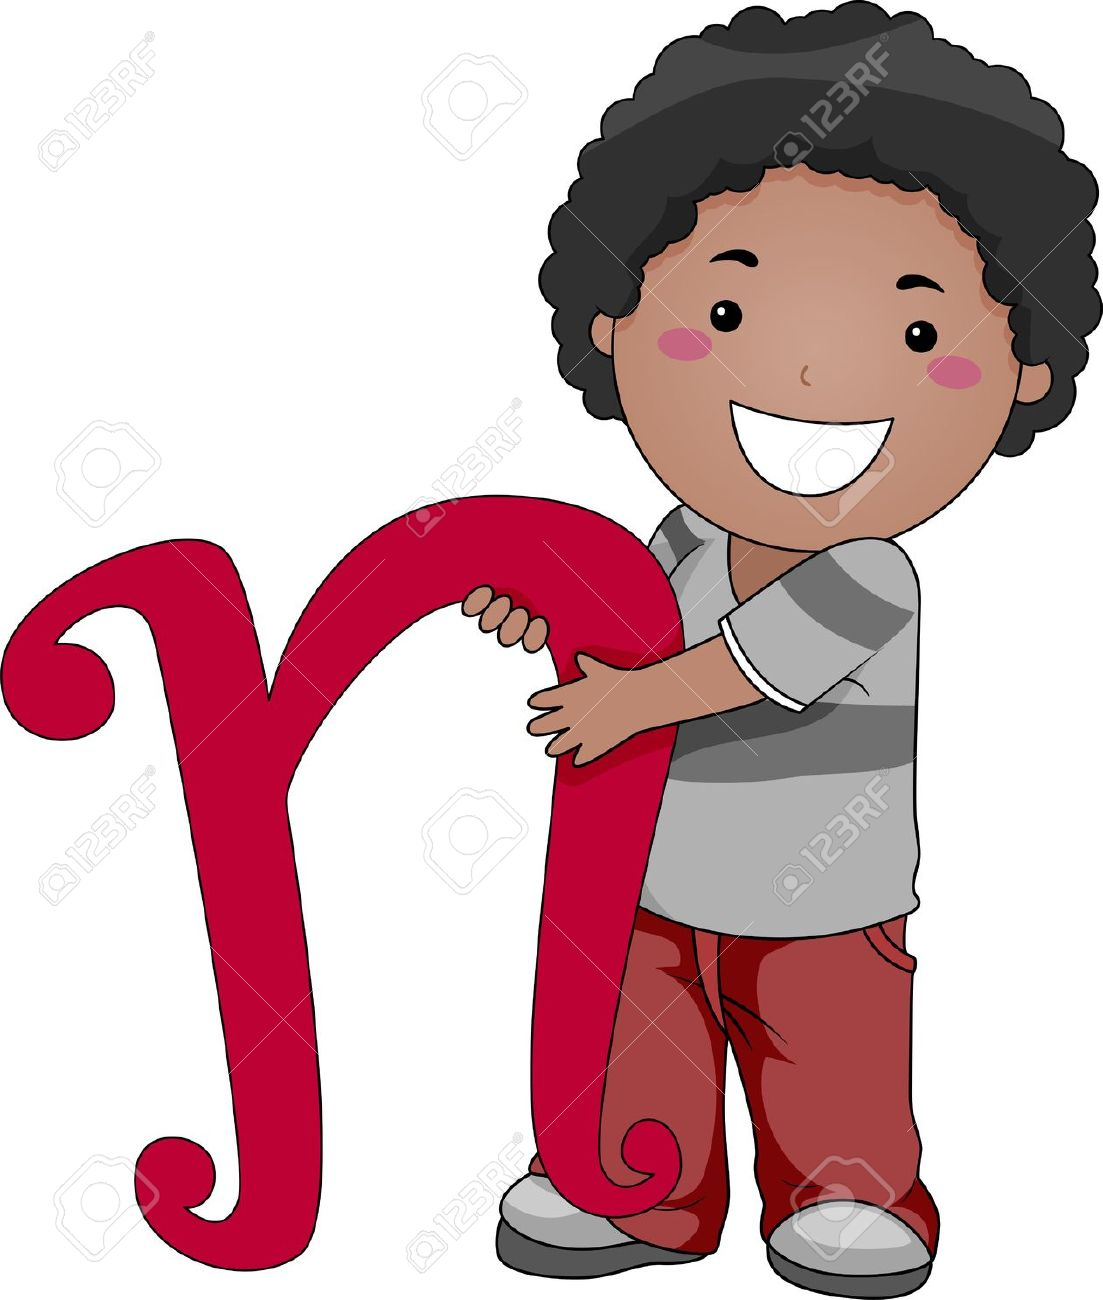 Kids holding alphabet letters clipart png transparent Kids holding alphabet letters clipart - ClipartFest png transparent